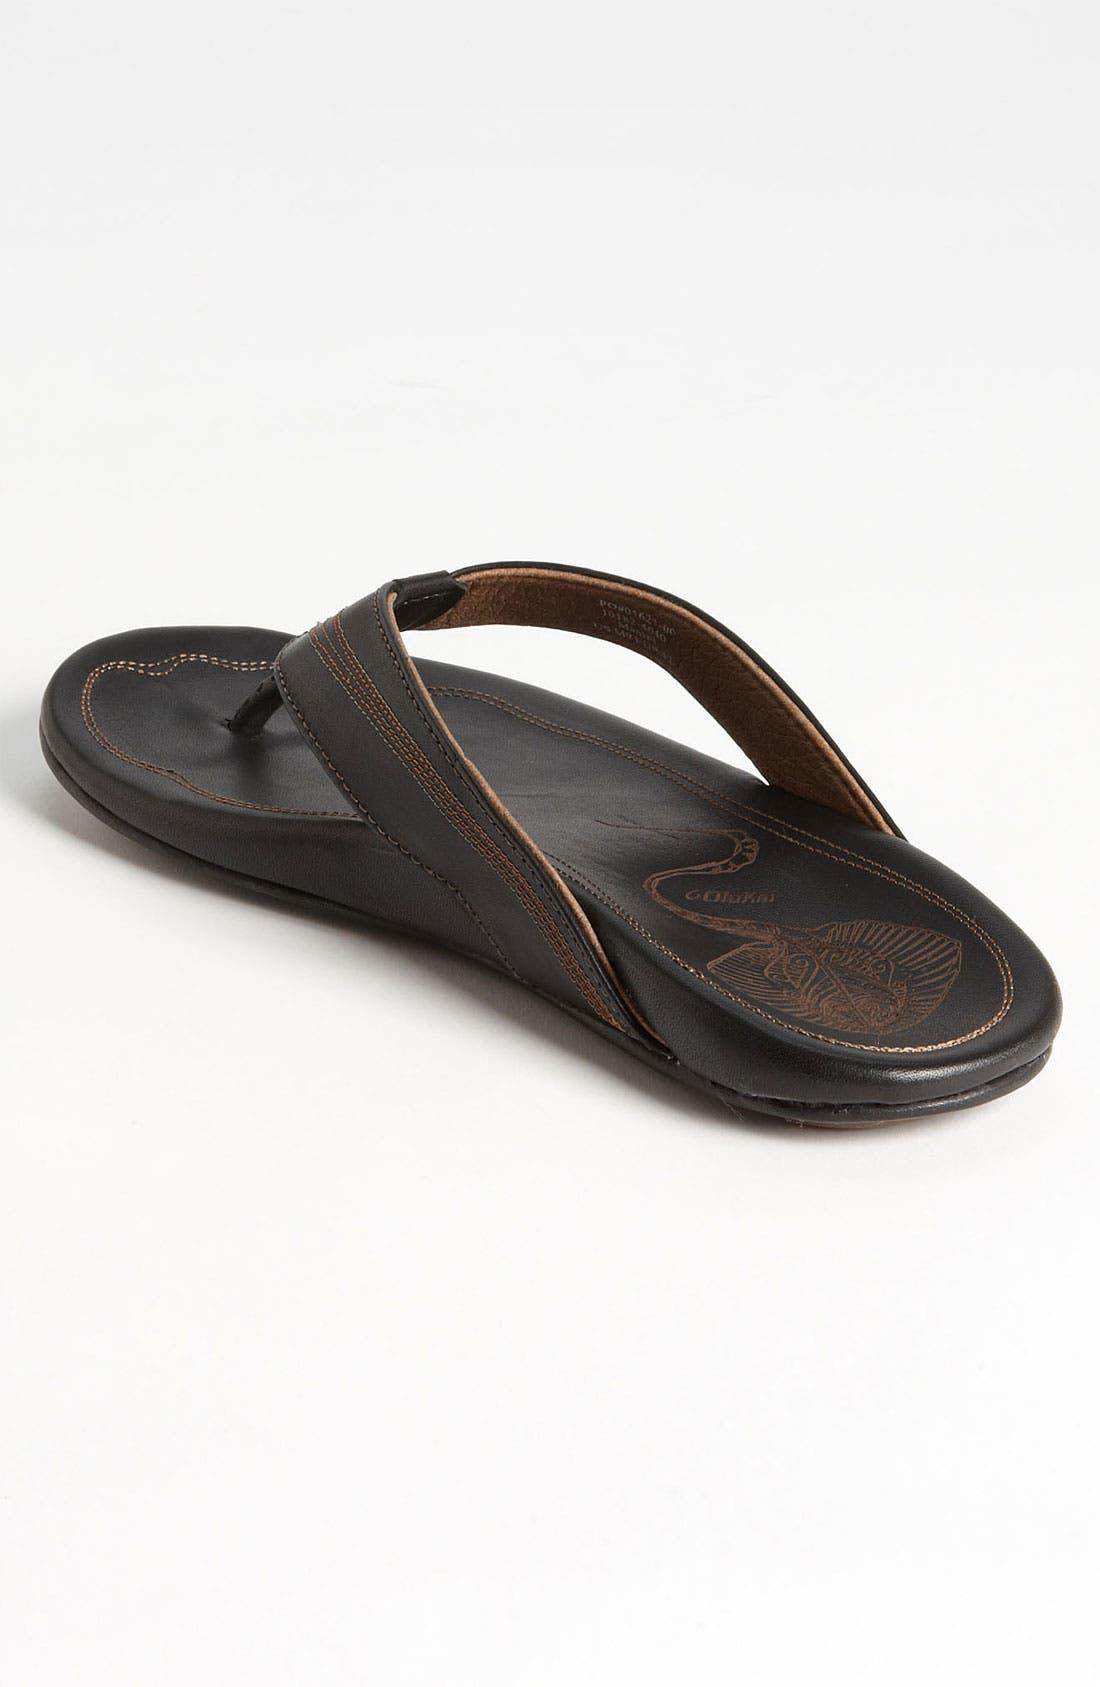 Alternate Image 2  - OluKai 'Manini' Flip Flop (Men)